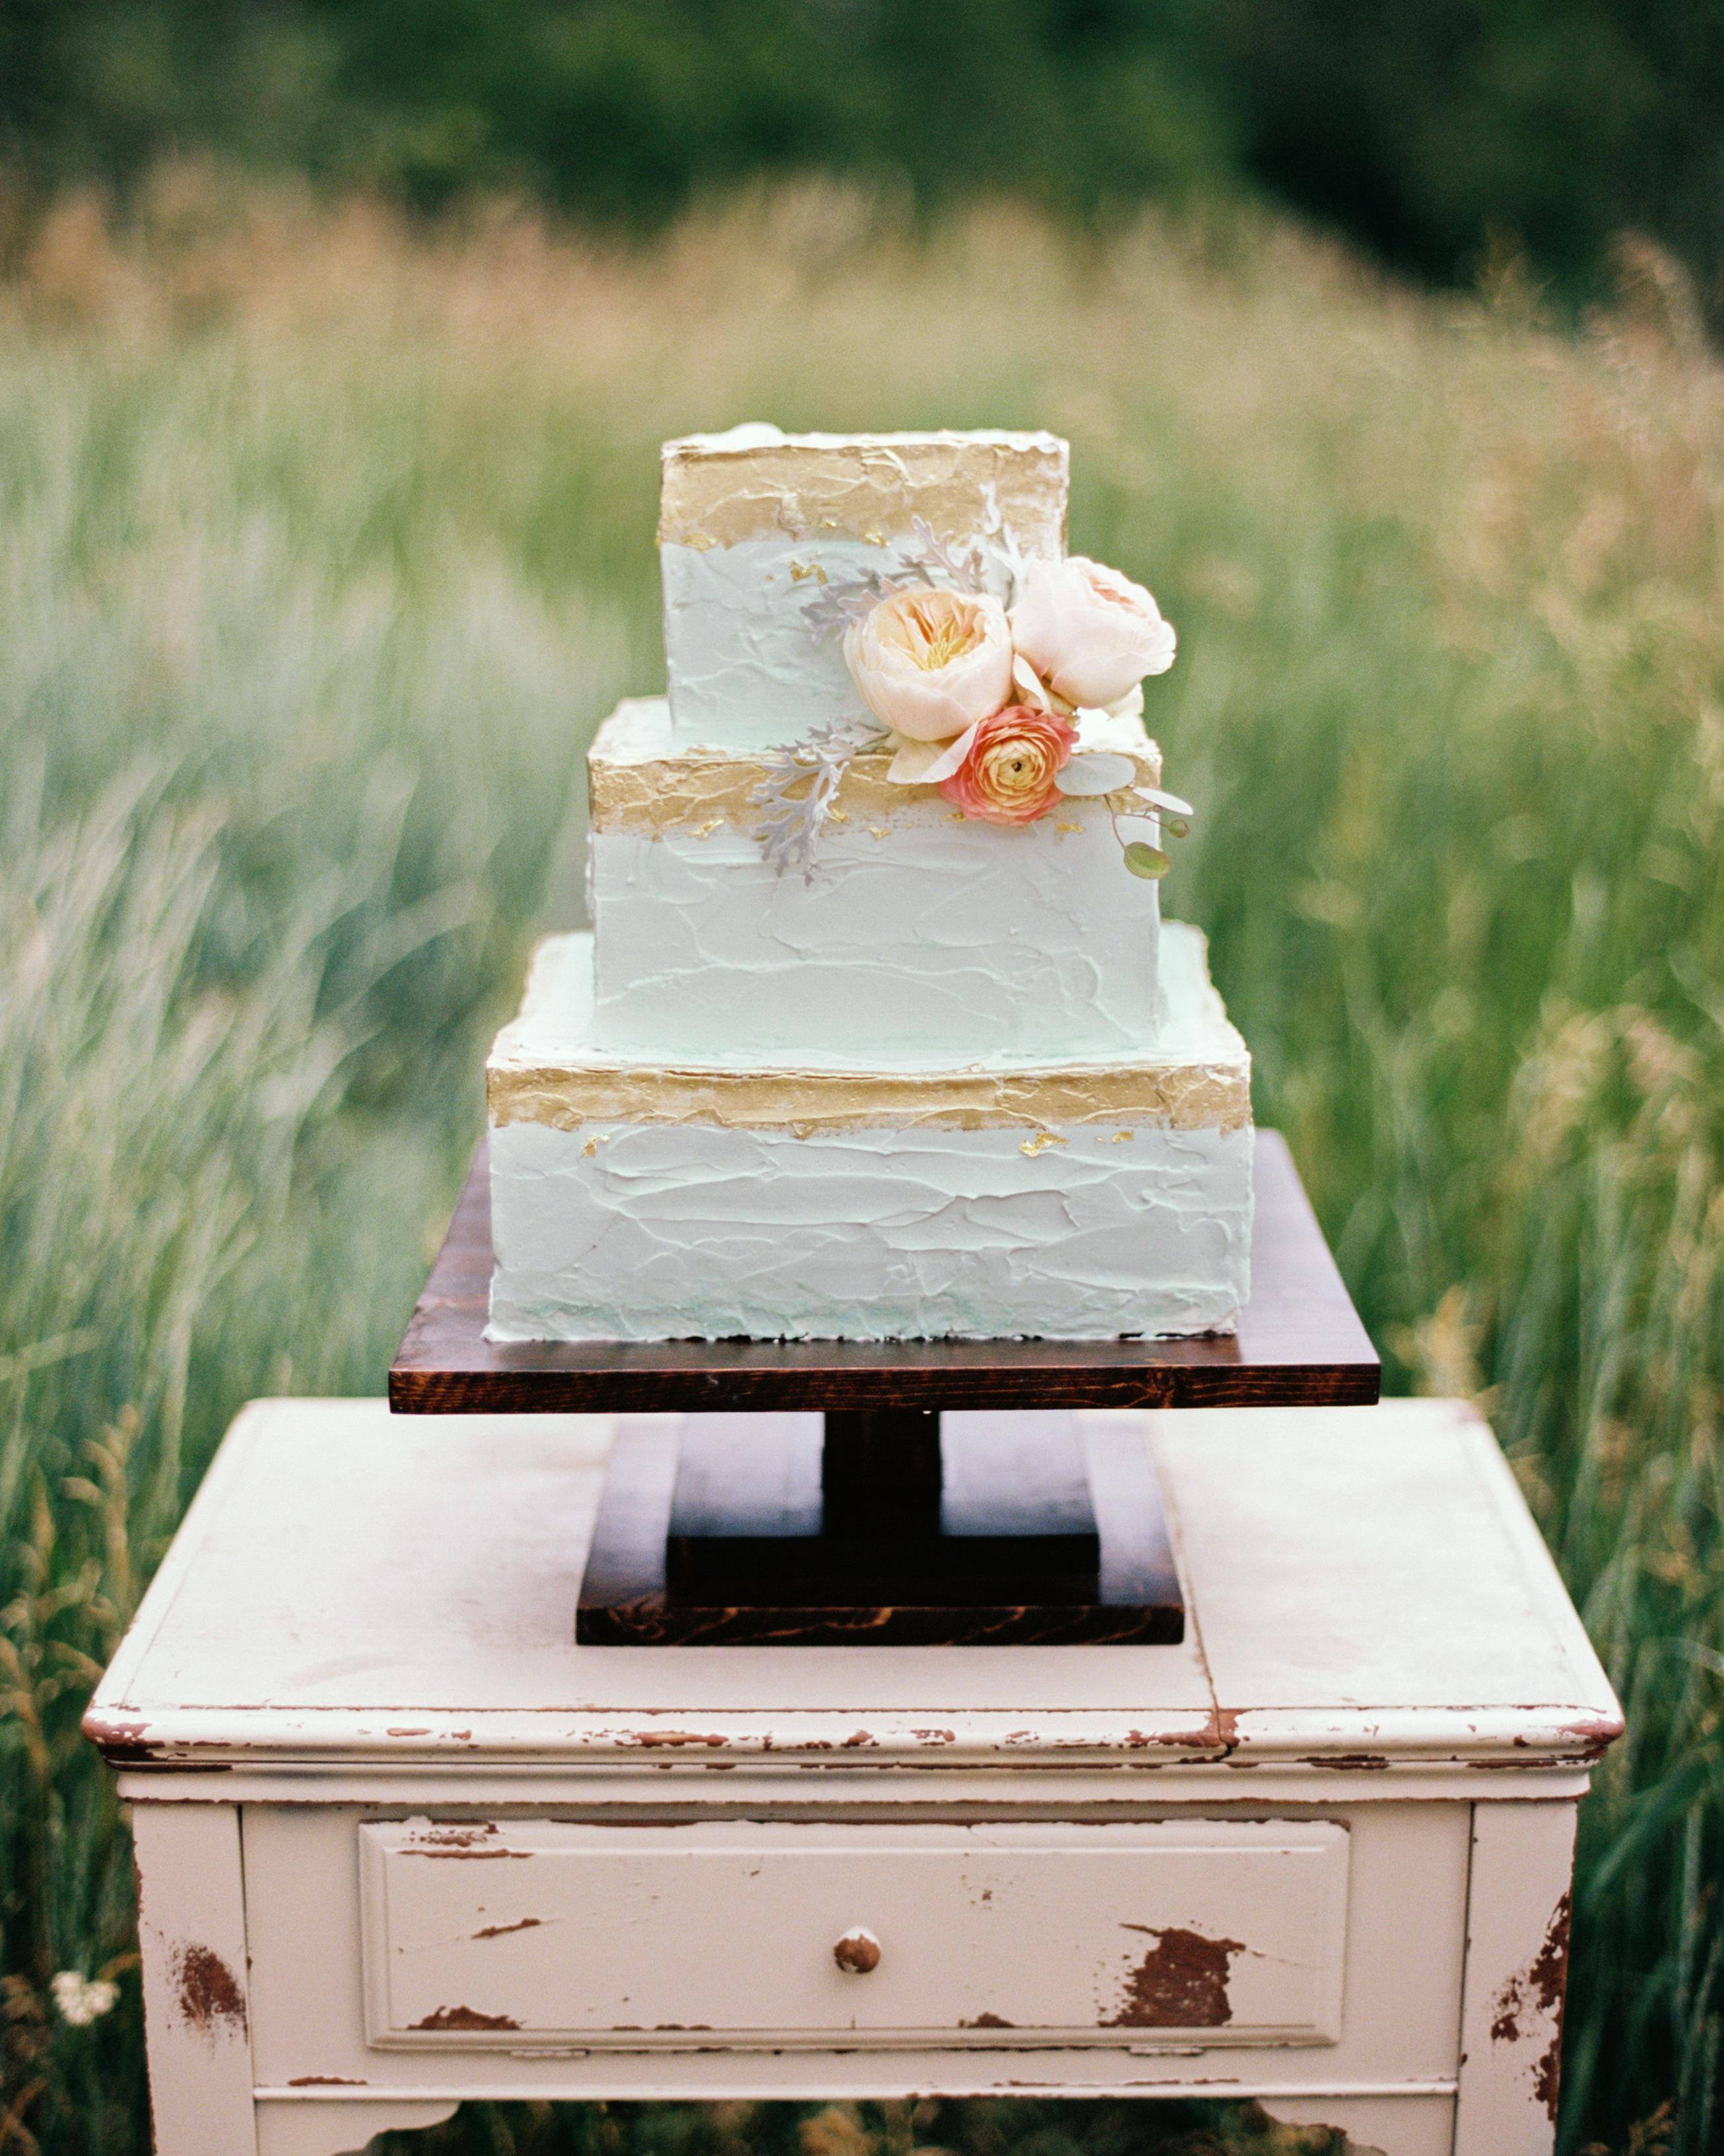 erin-jj-wedding-cake-21-s111742-0115.jpg